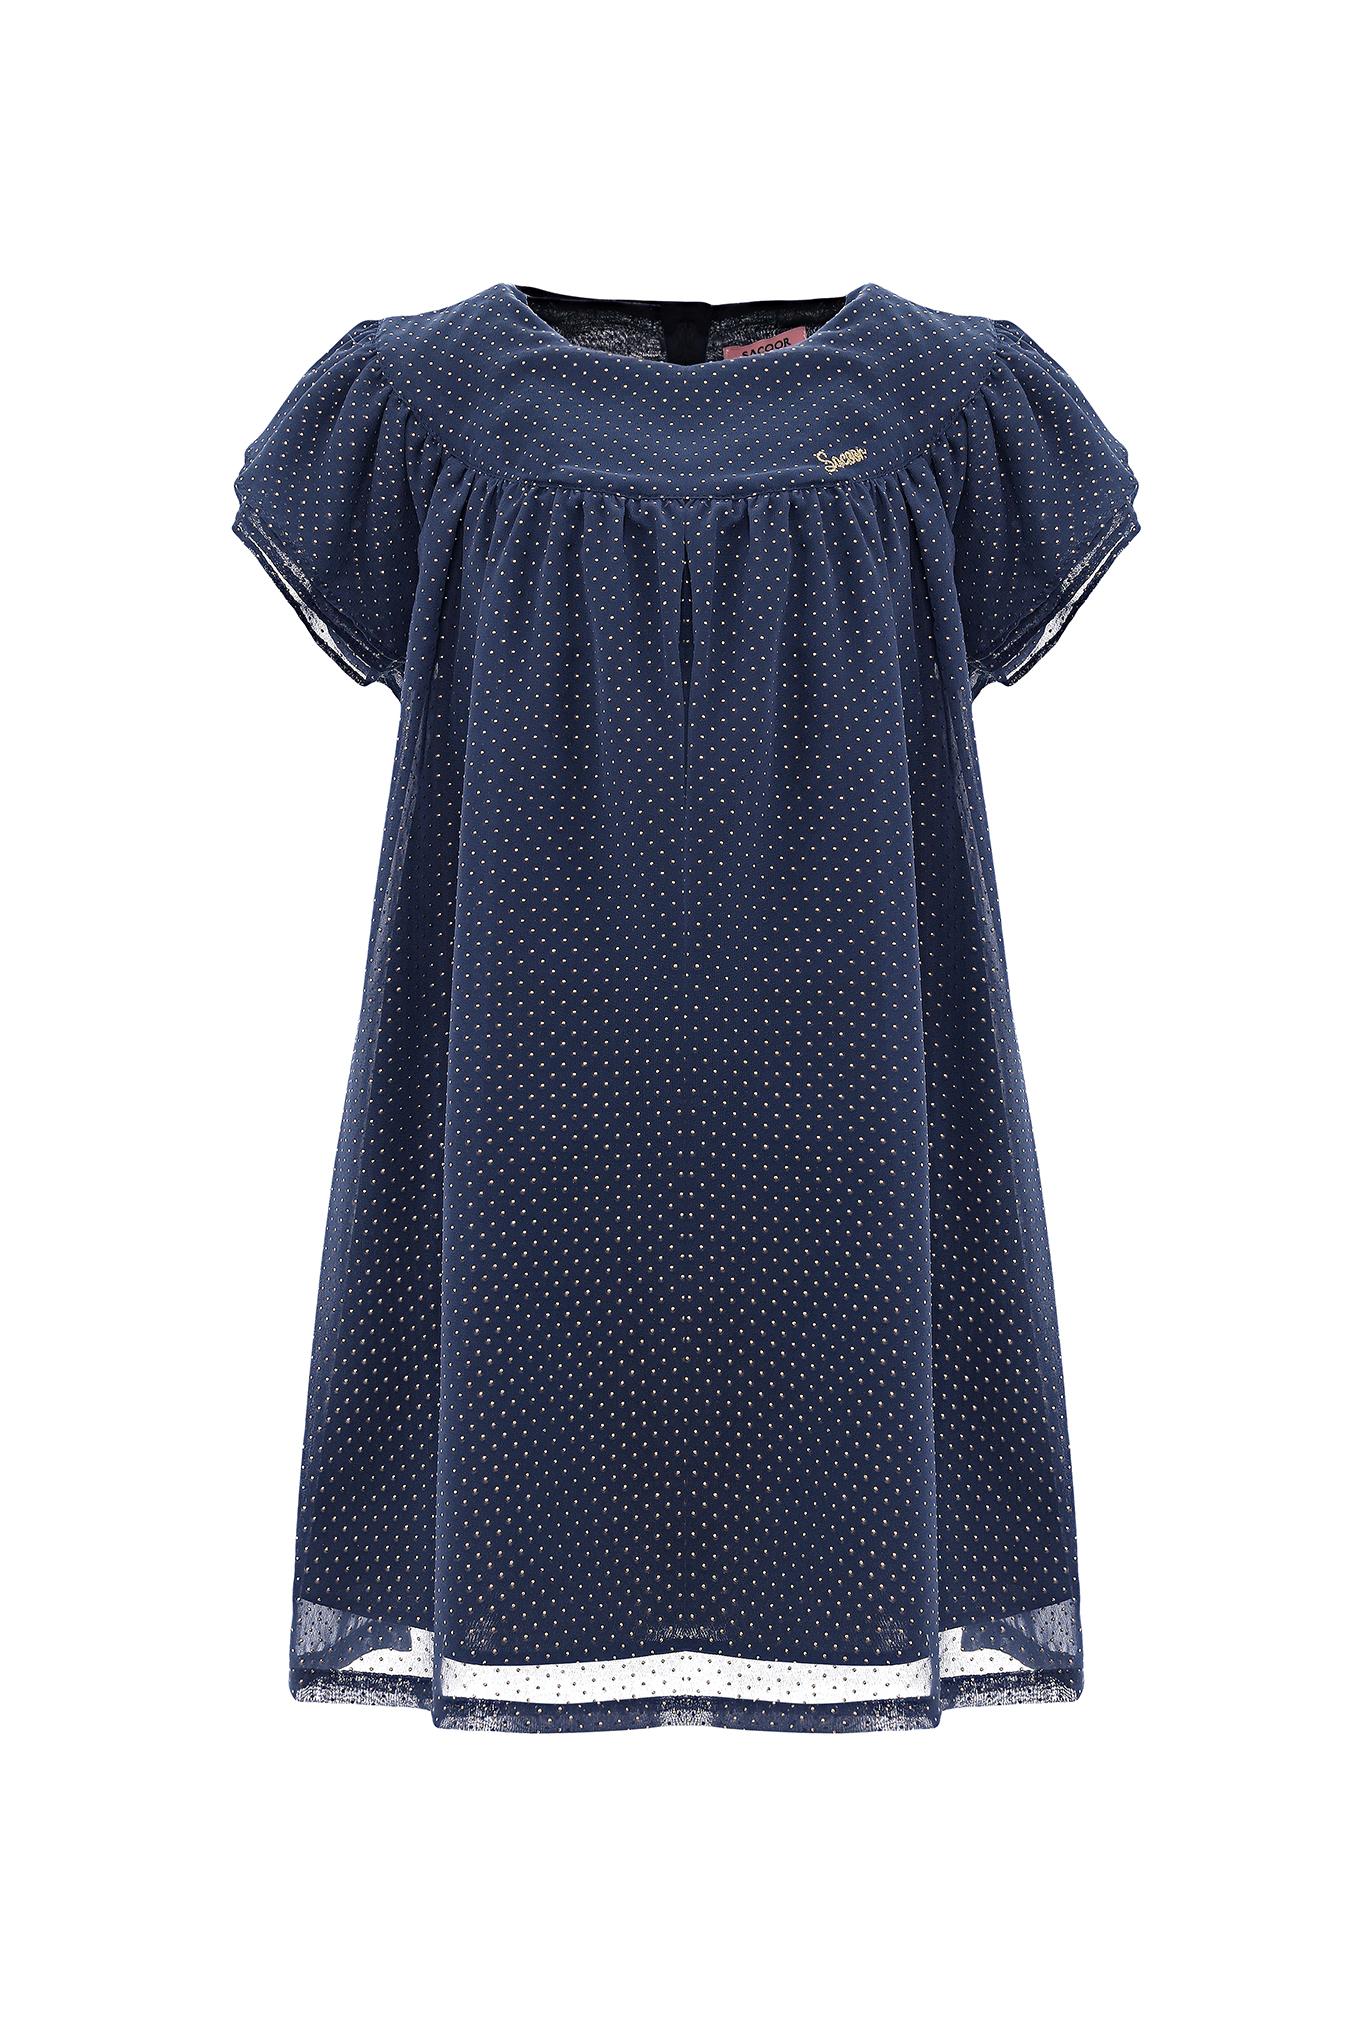 Dress Dark Blue Casual Girl